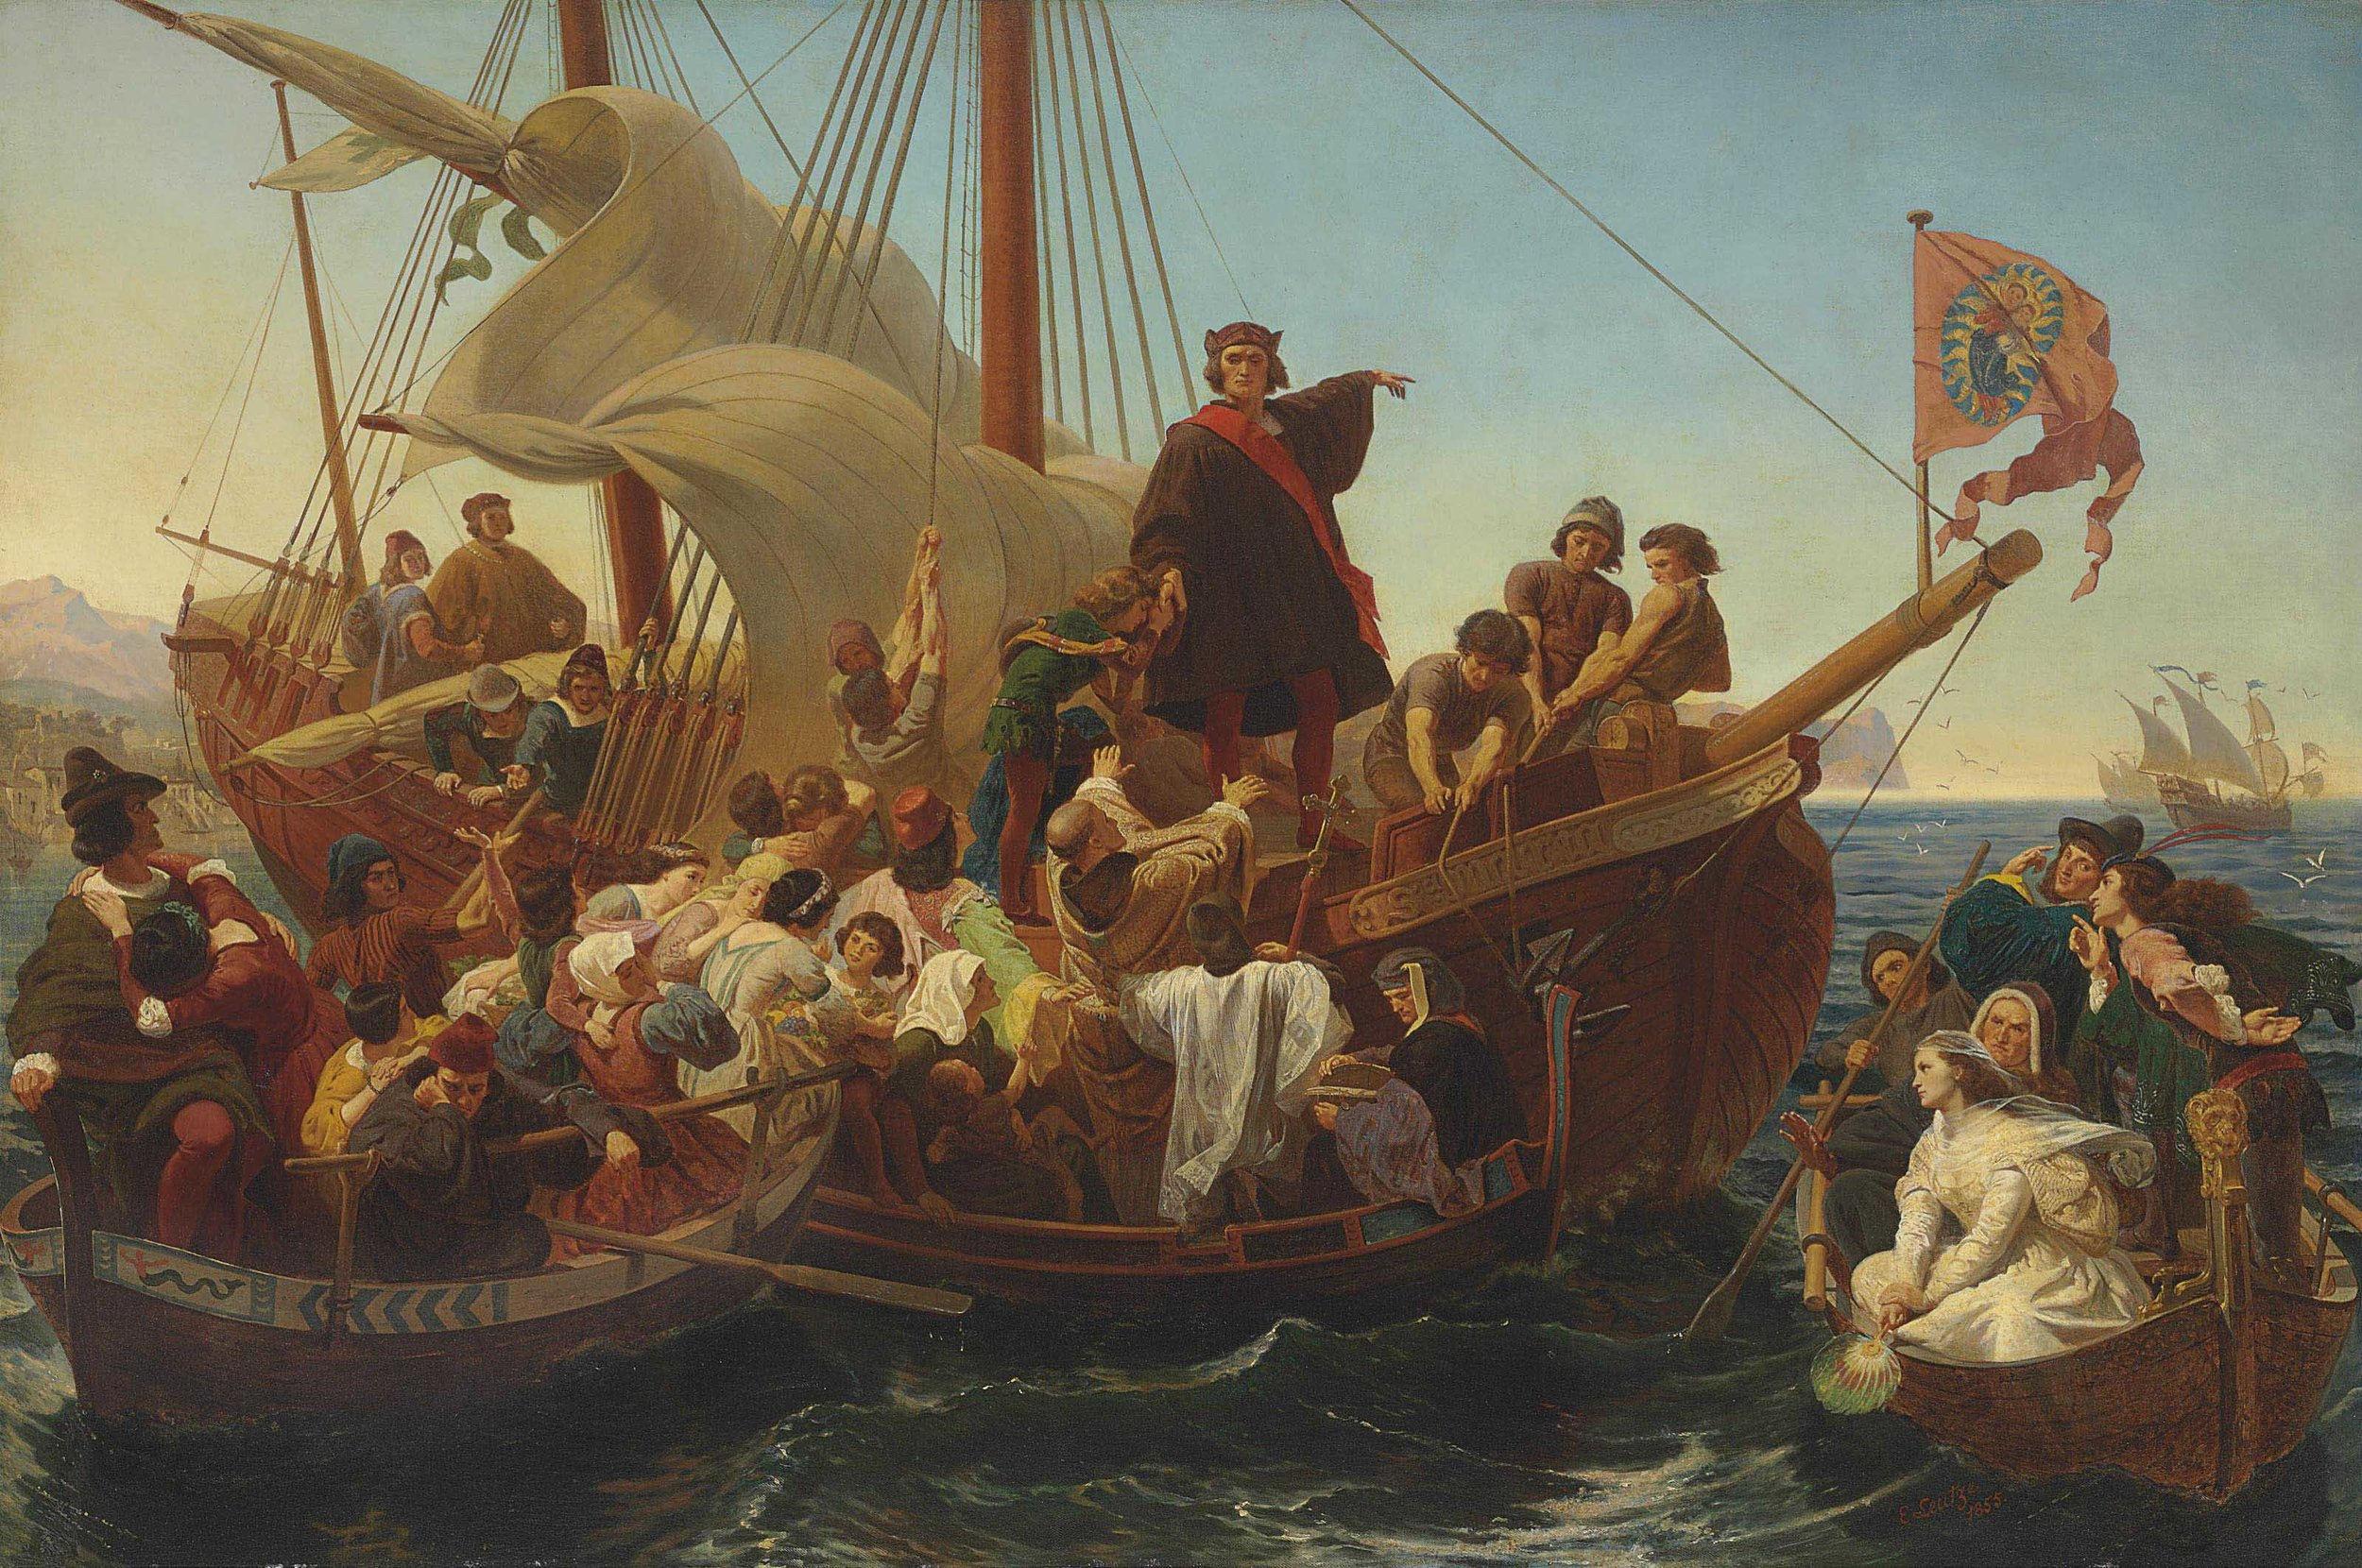 Emanuel Leutze,  Departure of Columbus from Palos in 1492 , 1855